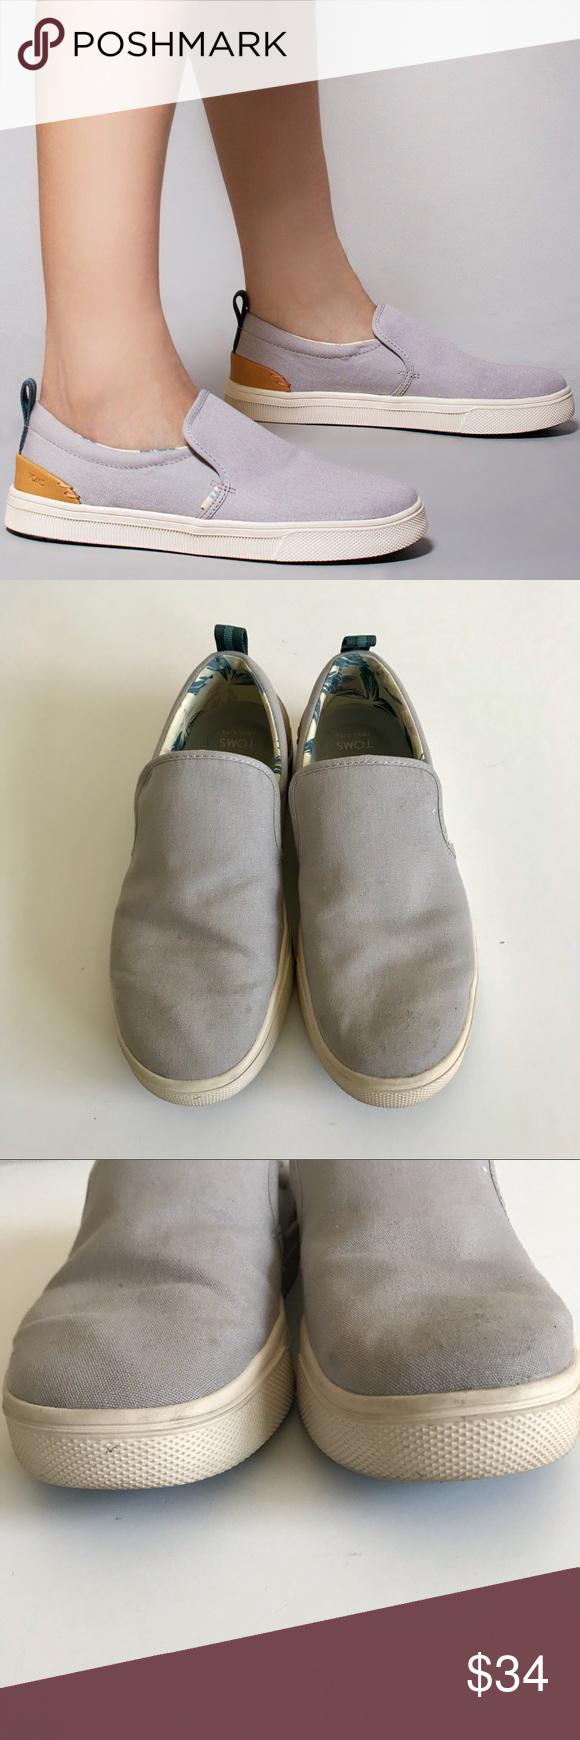 Trvl Lite Slip-Ons Shoes Gray Canvas